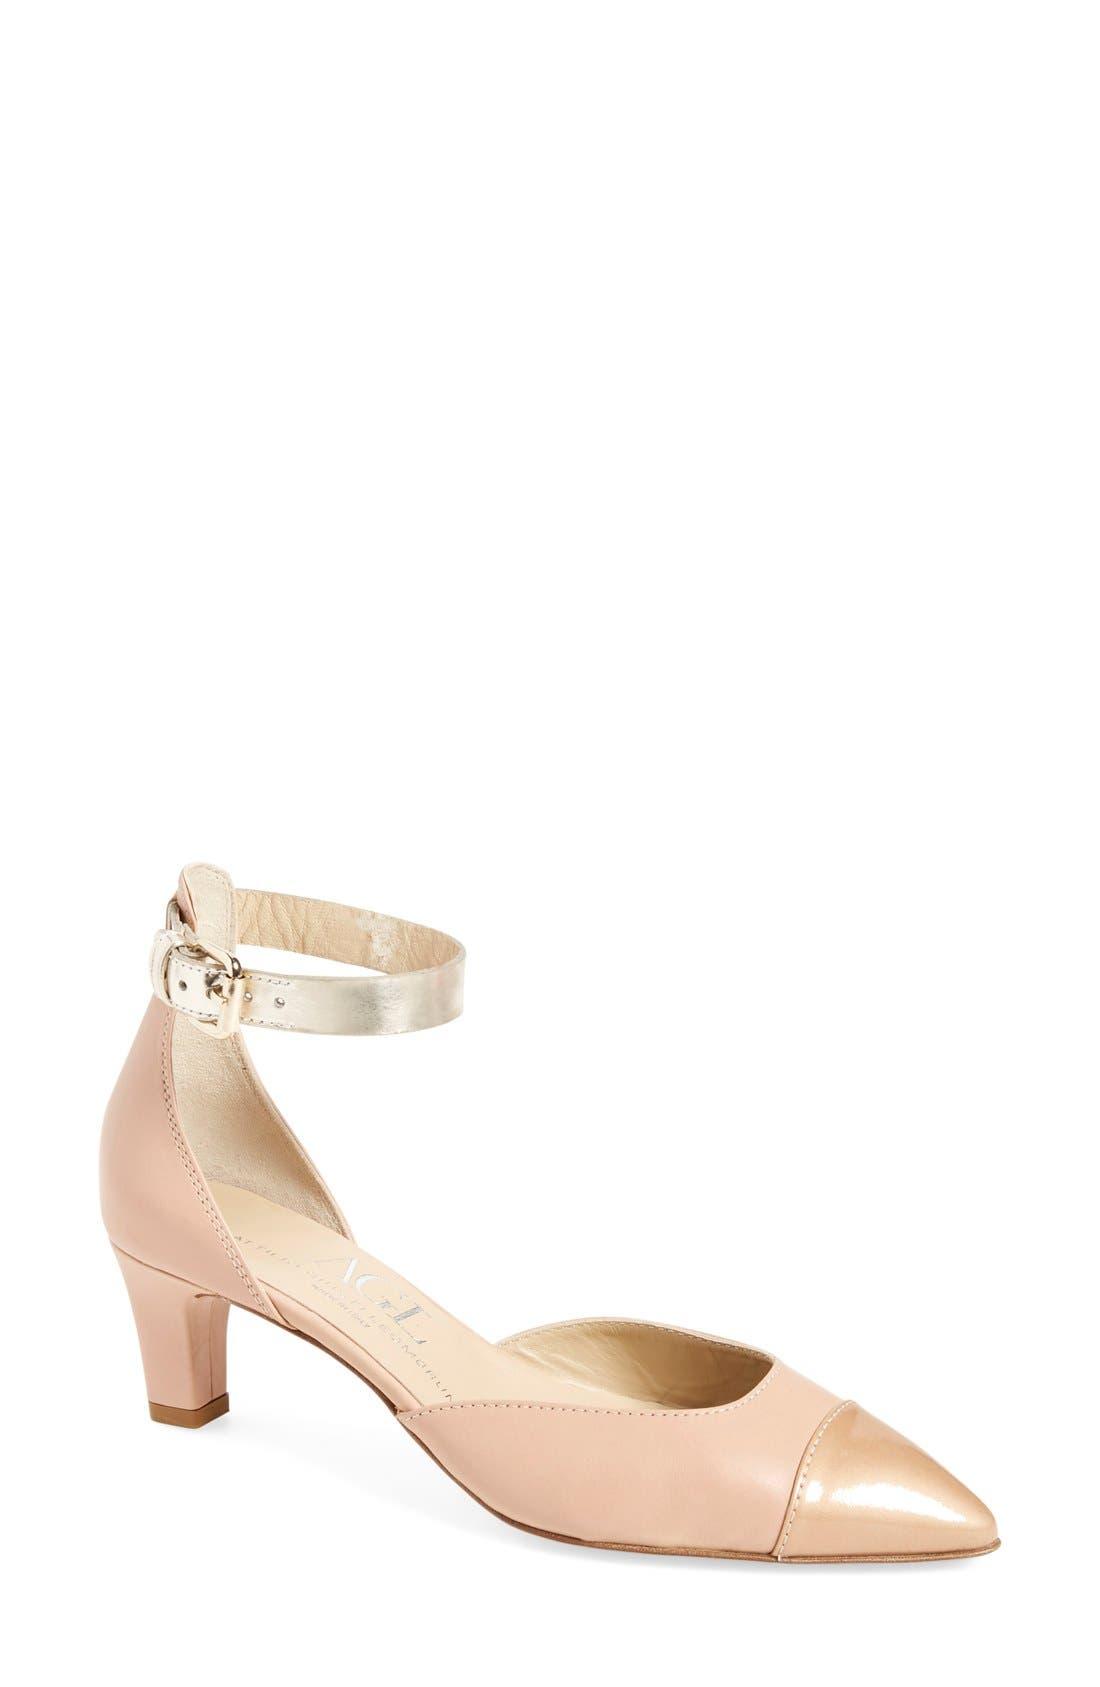 Main Image - AGL 'Claire' Ankle-Strap Pump (Women)